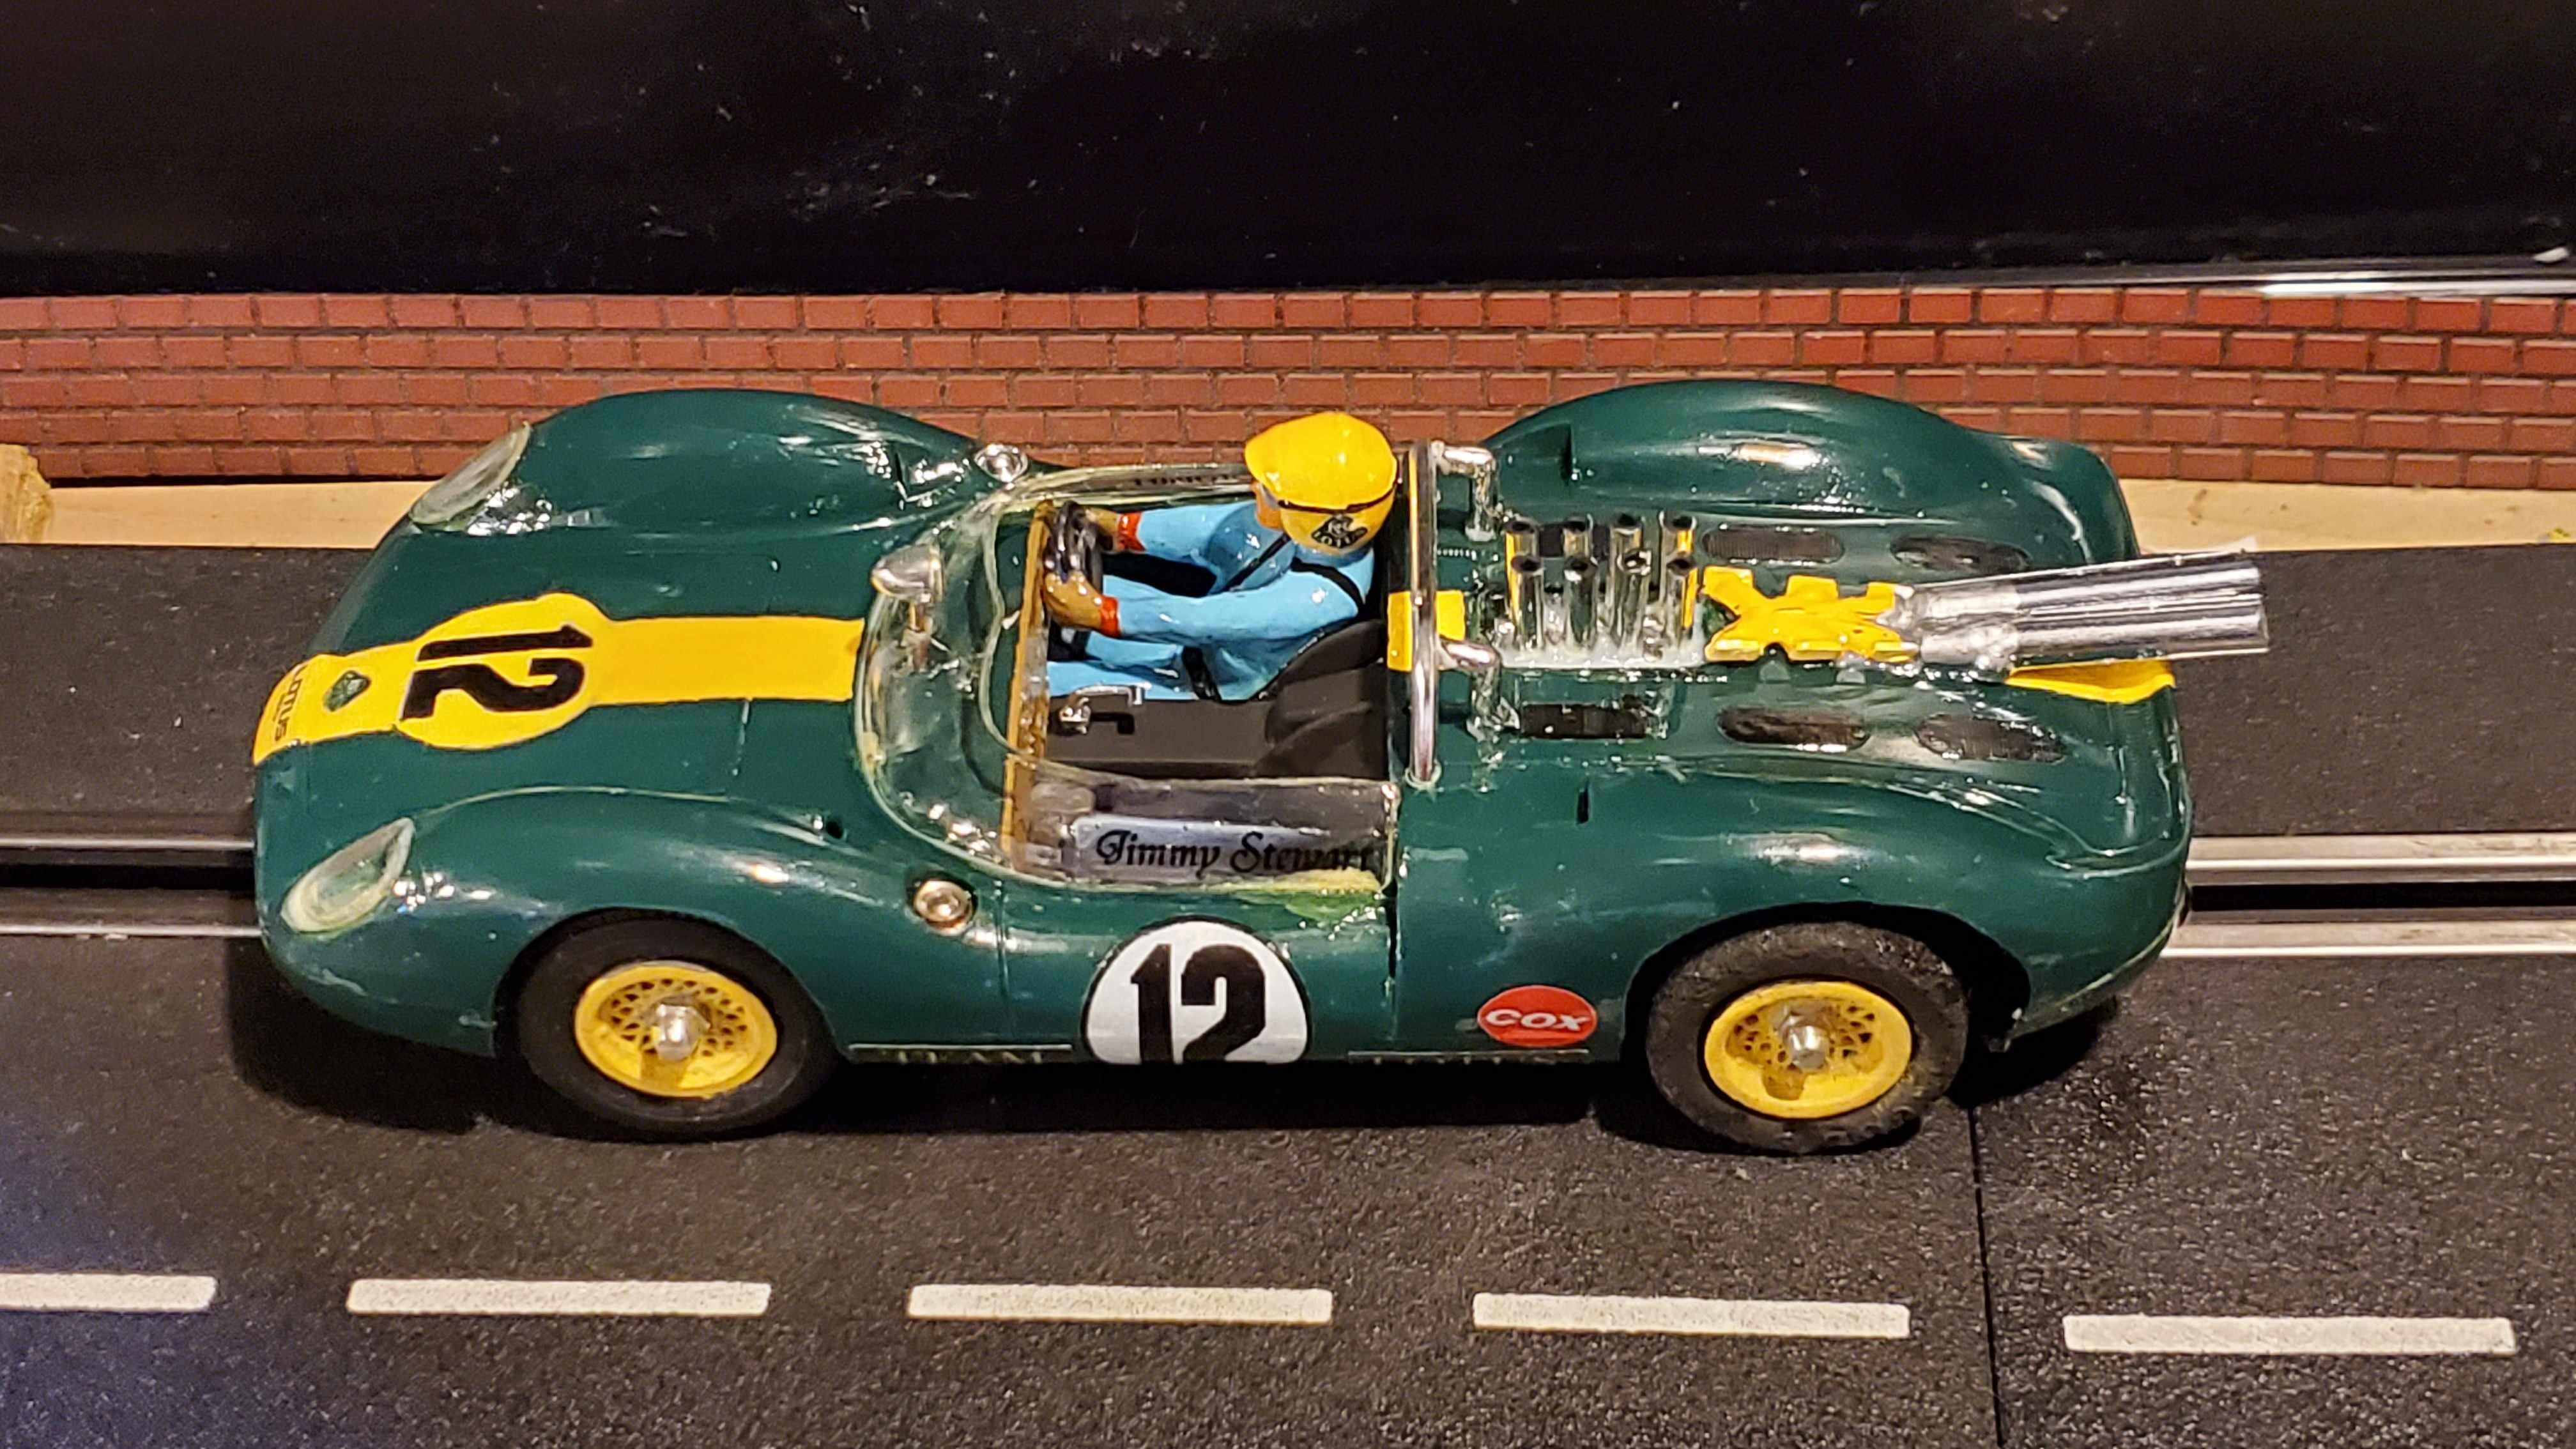 1965 COX Lotus Type 40 Slot Car 1:24 Scale Car 12